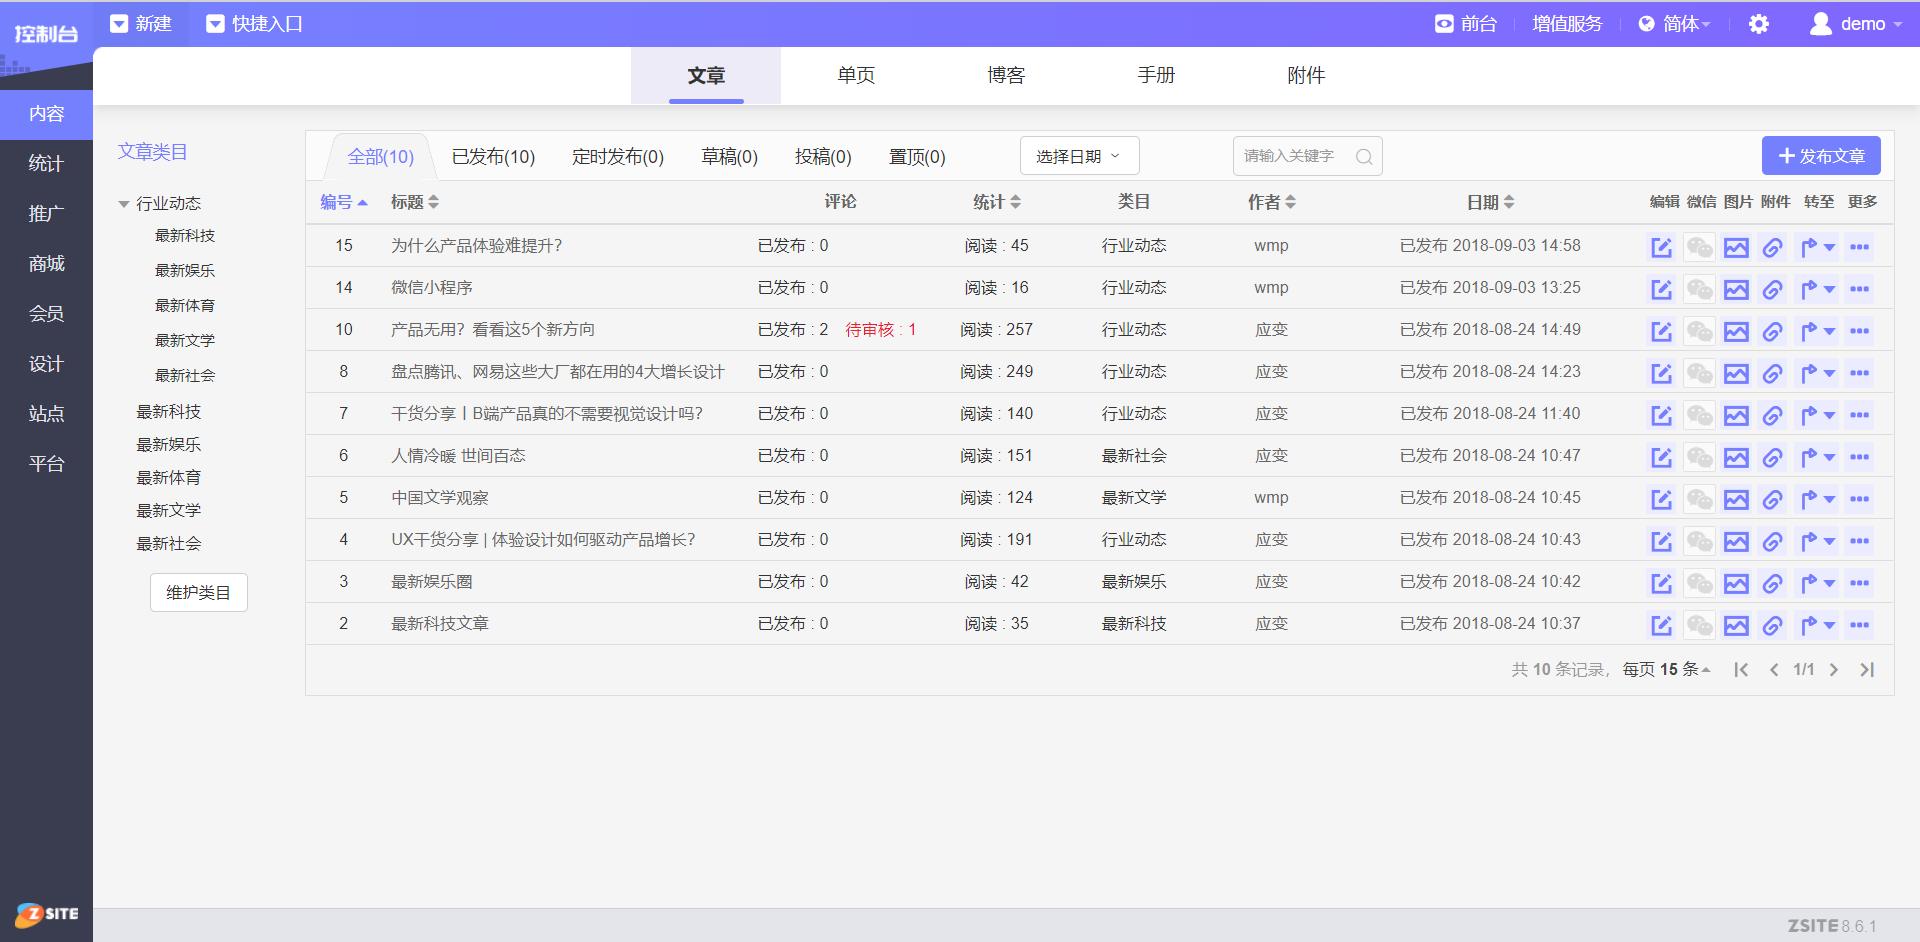 ZSITE全网营销系统平台(原蝉知系统)v8.6.1源码下载 自带优化功能